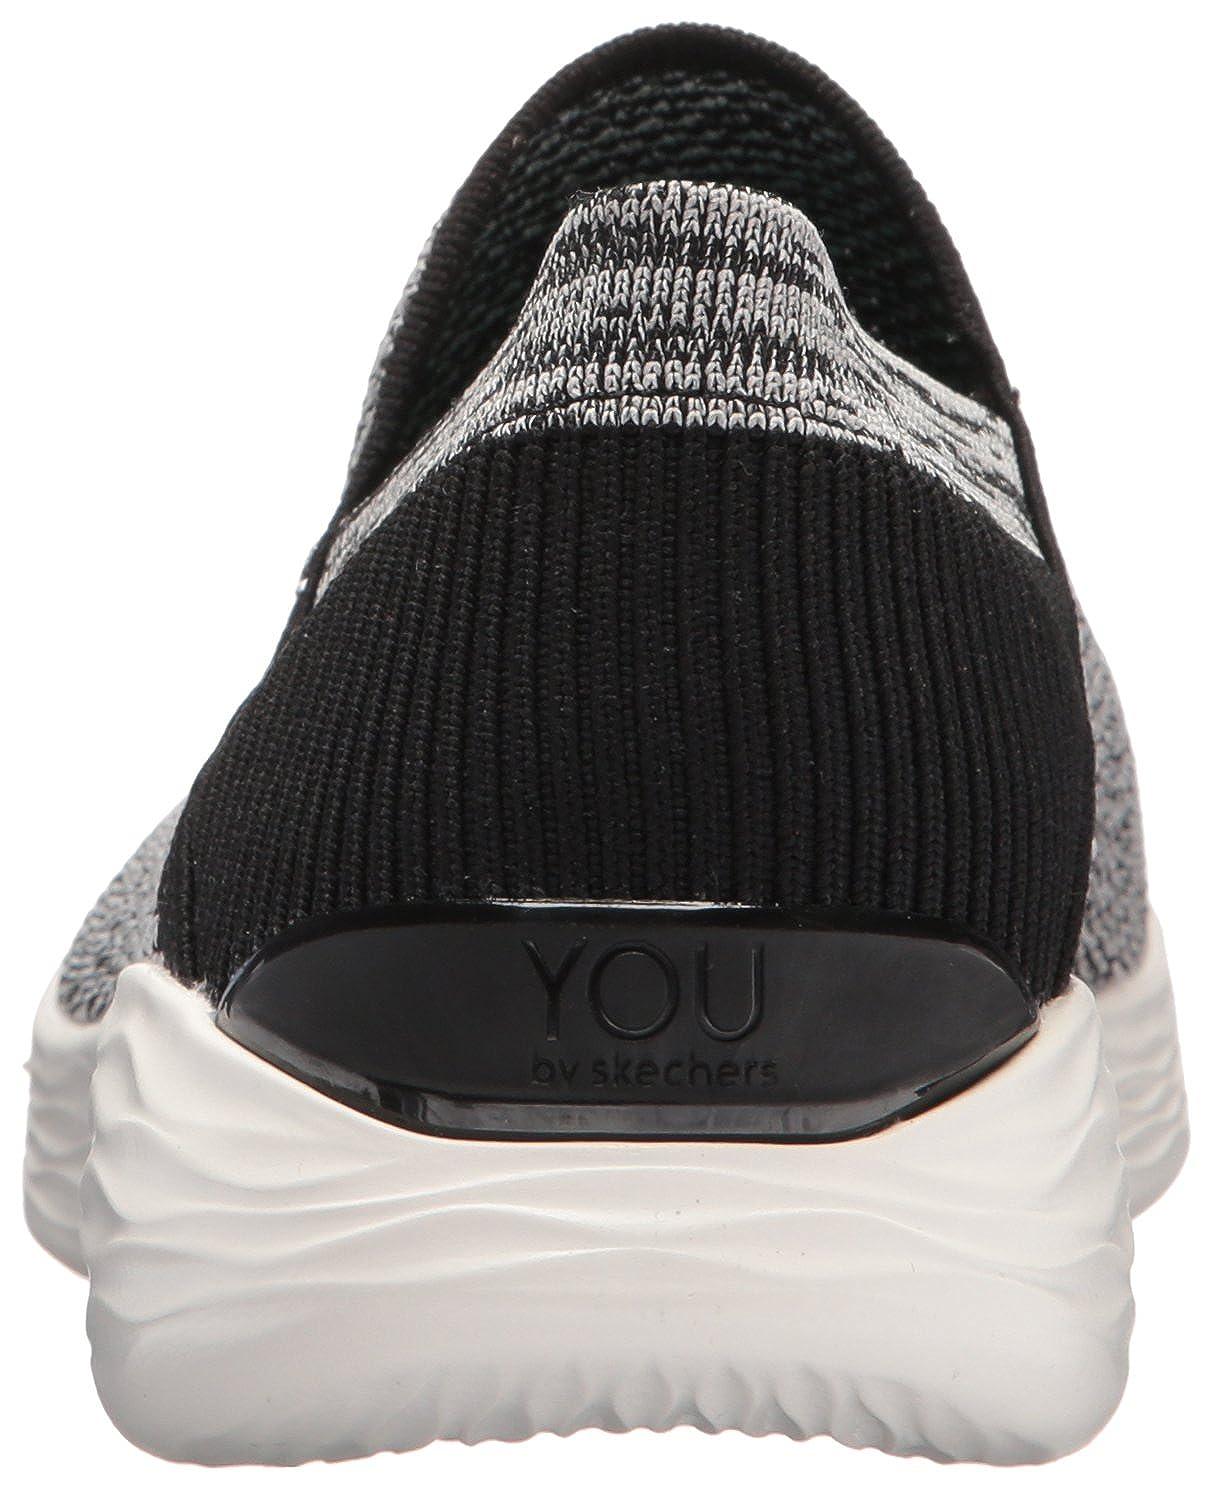 606eb81ef8 Skechers Womens You - Rise Sneakers: Skechers: Amazon.ca: Shoes & Handbags